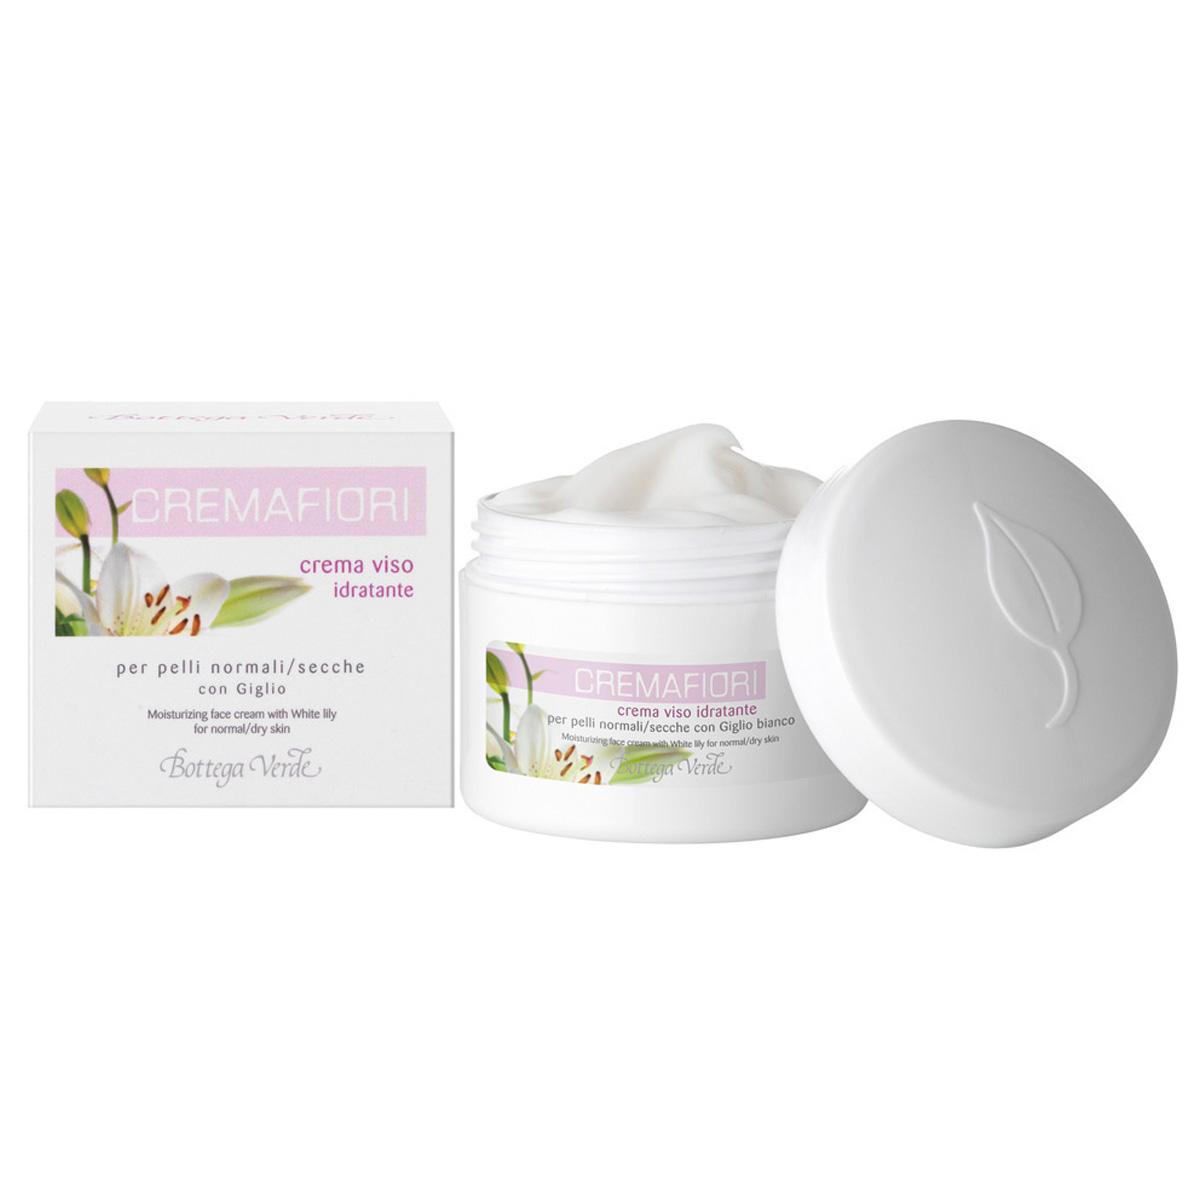 Crema hidratanta cu crin alb pentru ten normal si uscat - Cremafiori, 50 ML